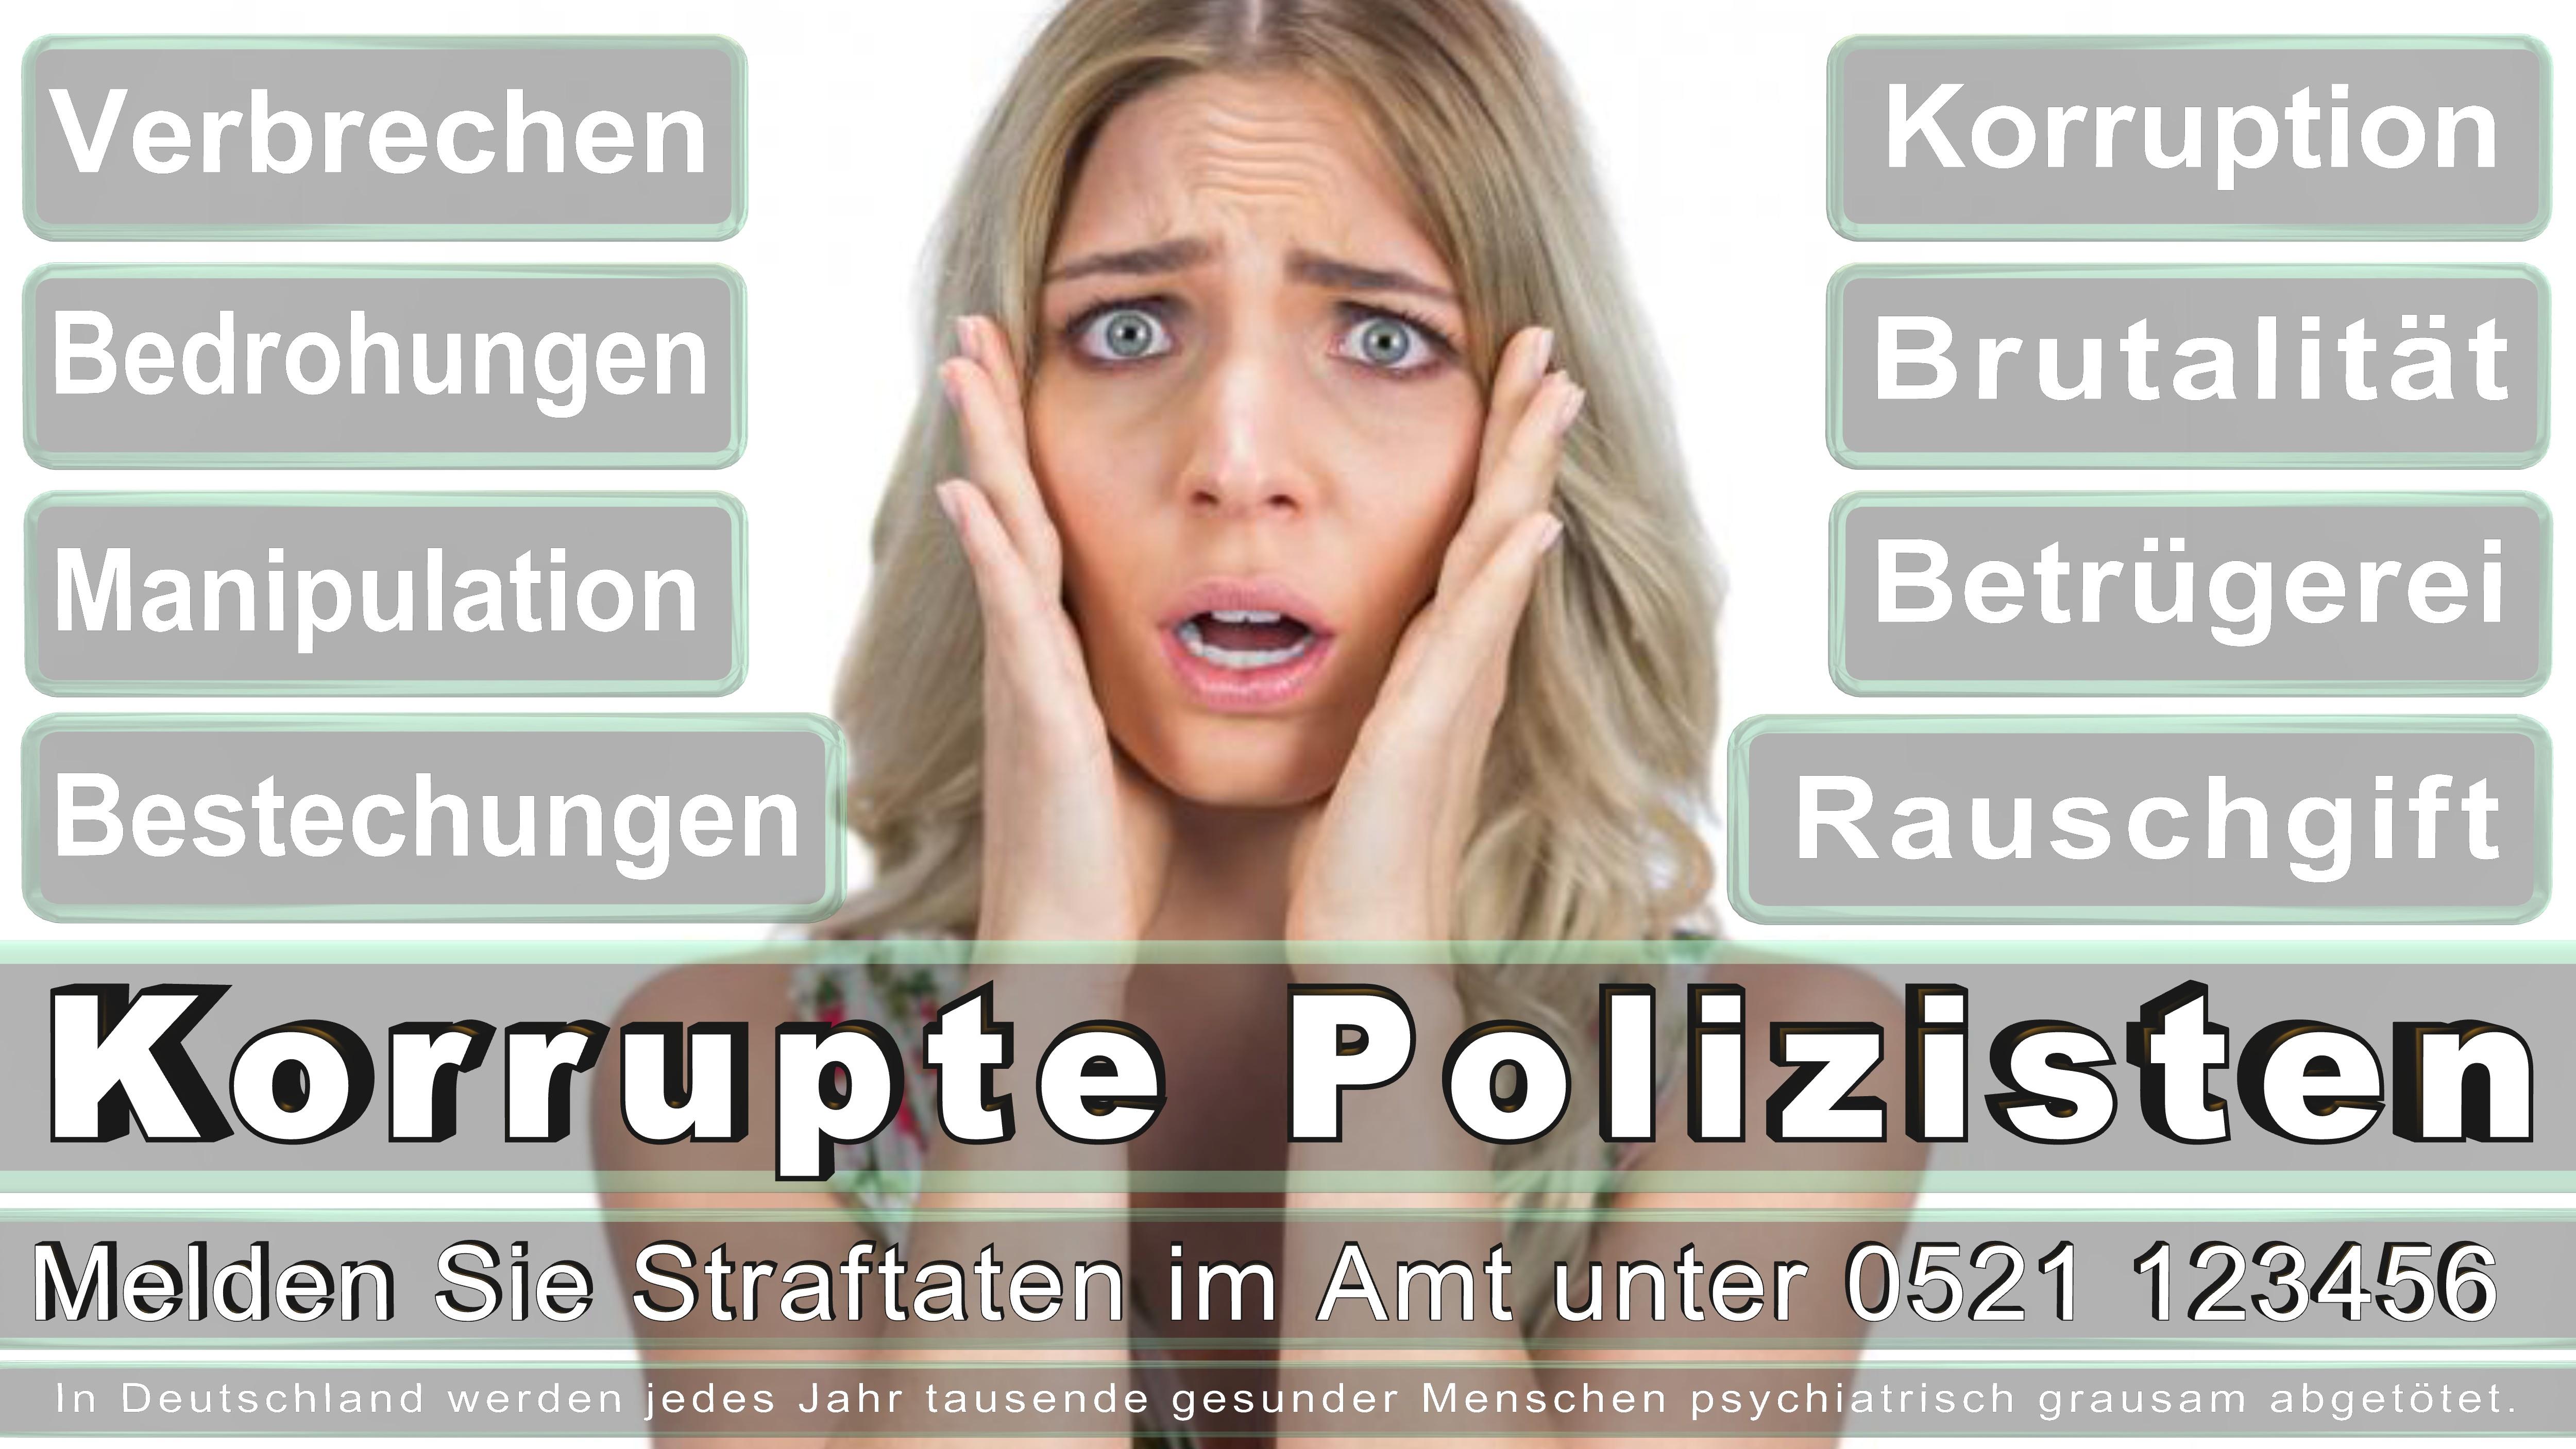 Polizei-Bielefeld-Polizei-Bielefeld-Polizei-Bielefeld (160)